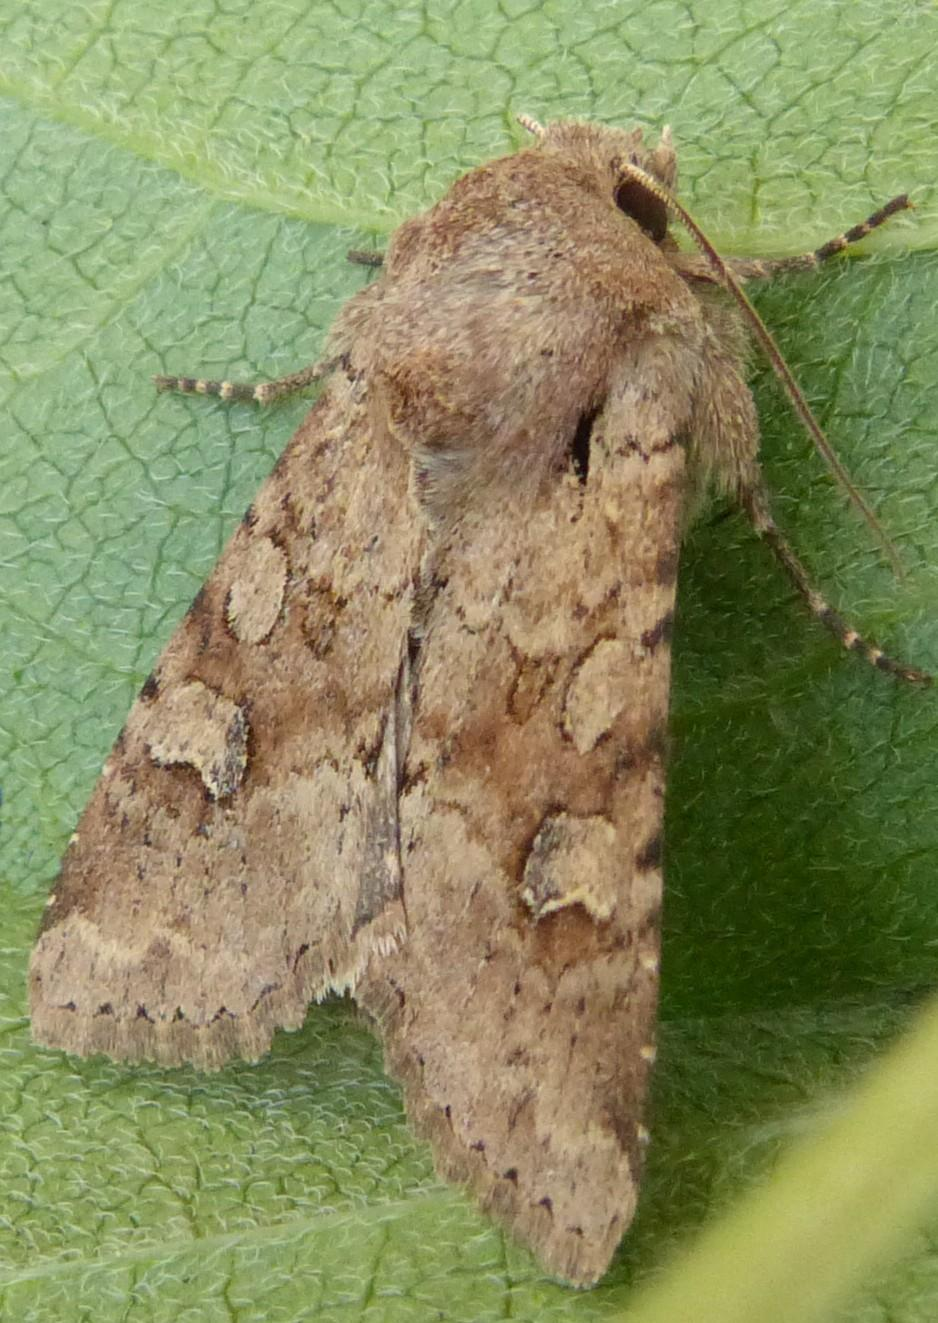 Rustic Shoulder Knot Apamea Sordens Norfolk Moths